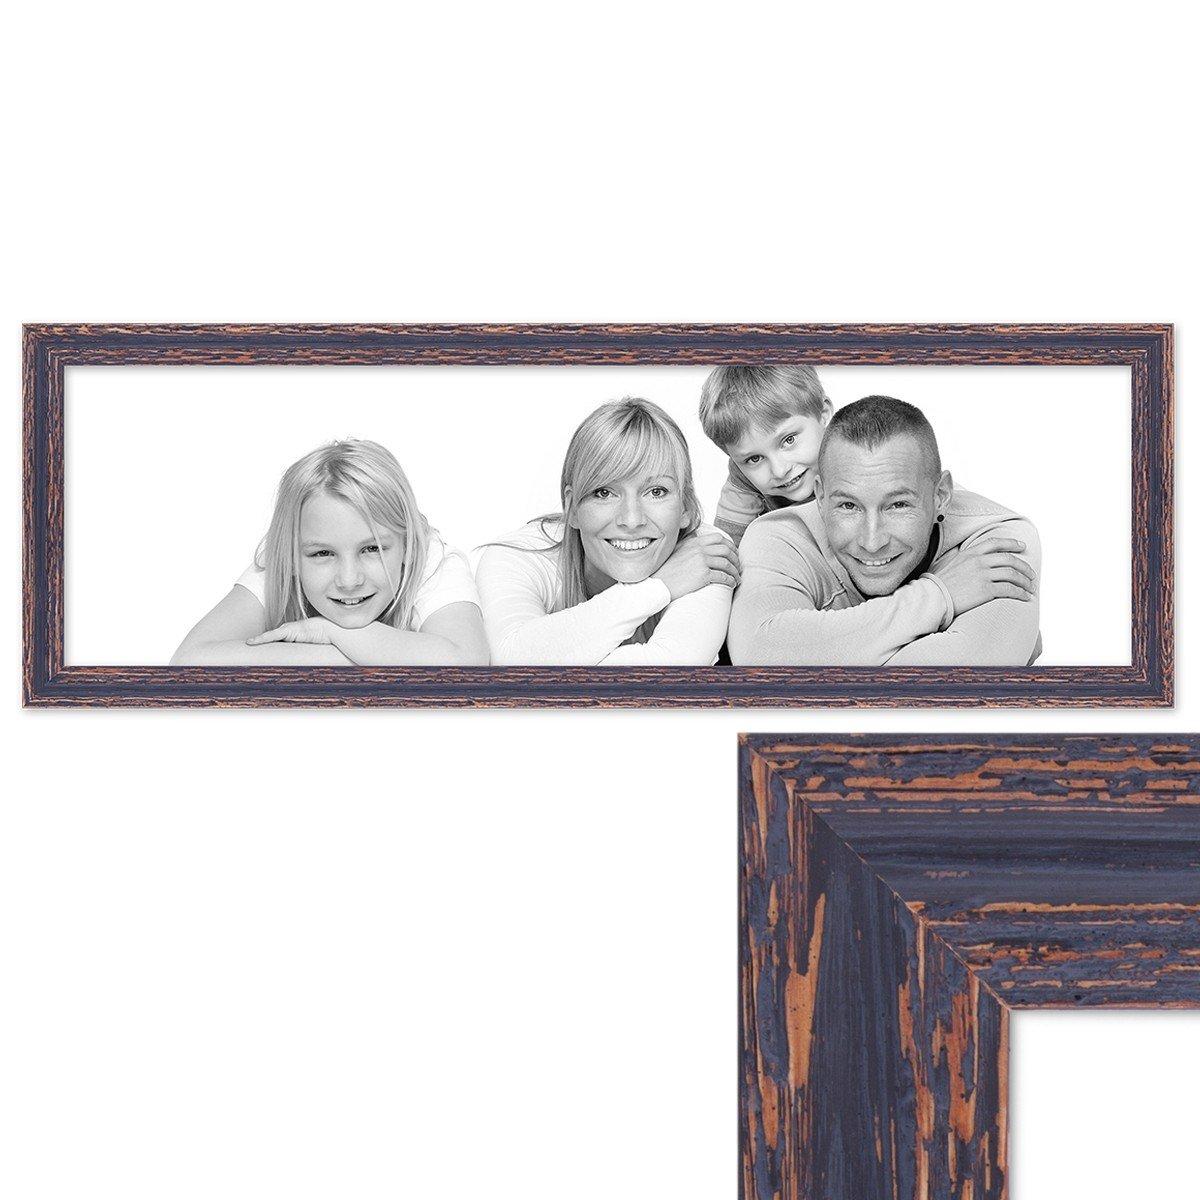 Amazon.de: PHOTOLINI Panorama-Bilderrahmen Vintage 30x90 cm Holz ...